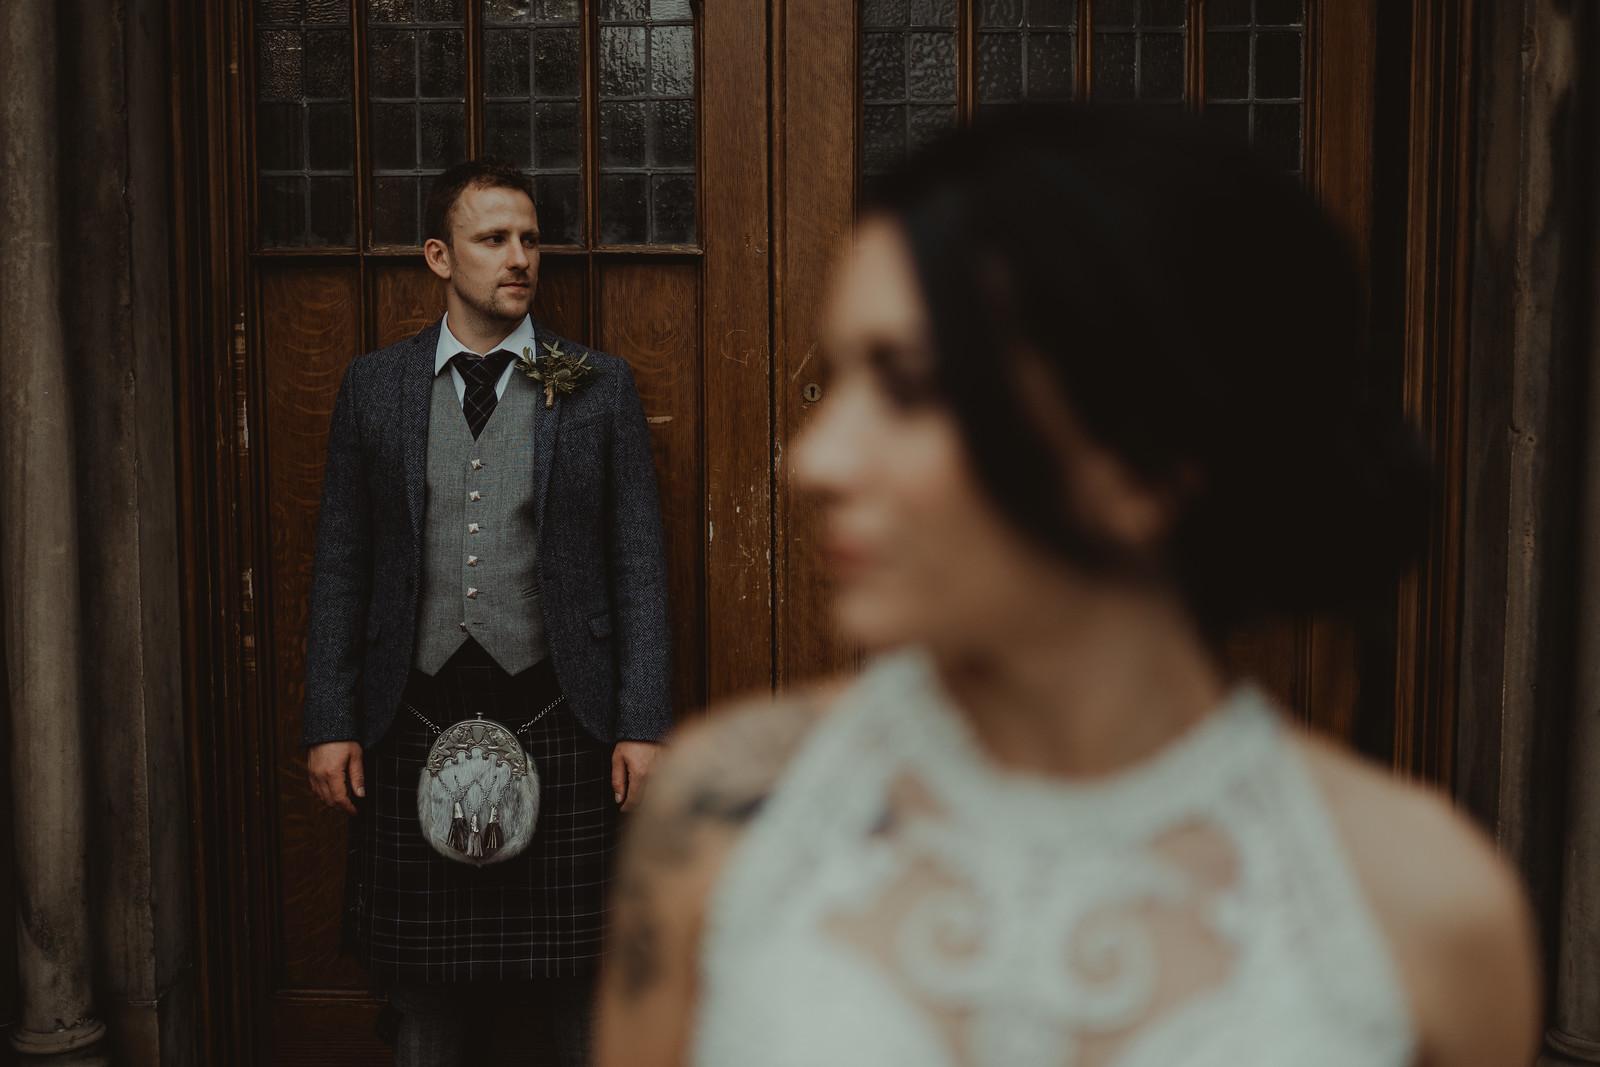 Wedding photo of bride and groom - Wedding photographers Oxford